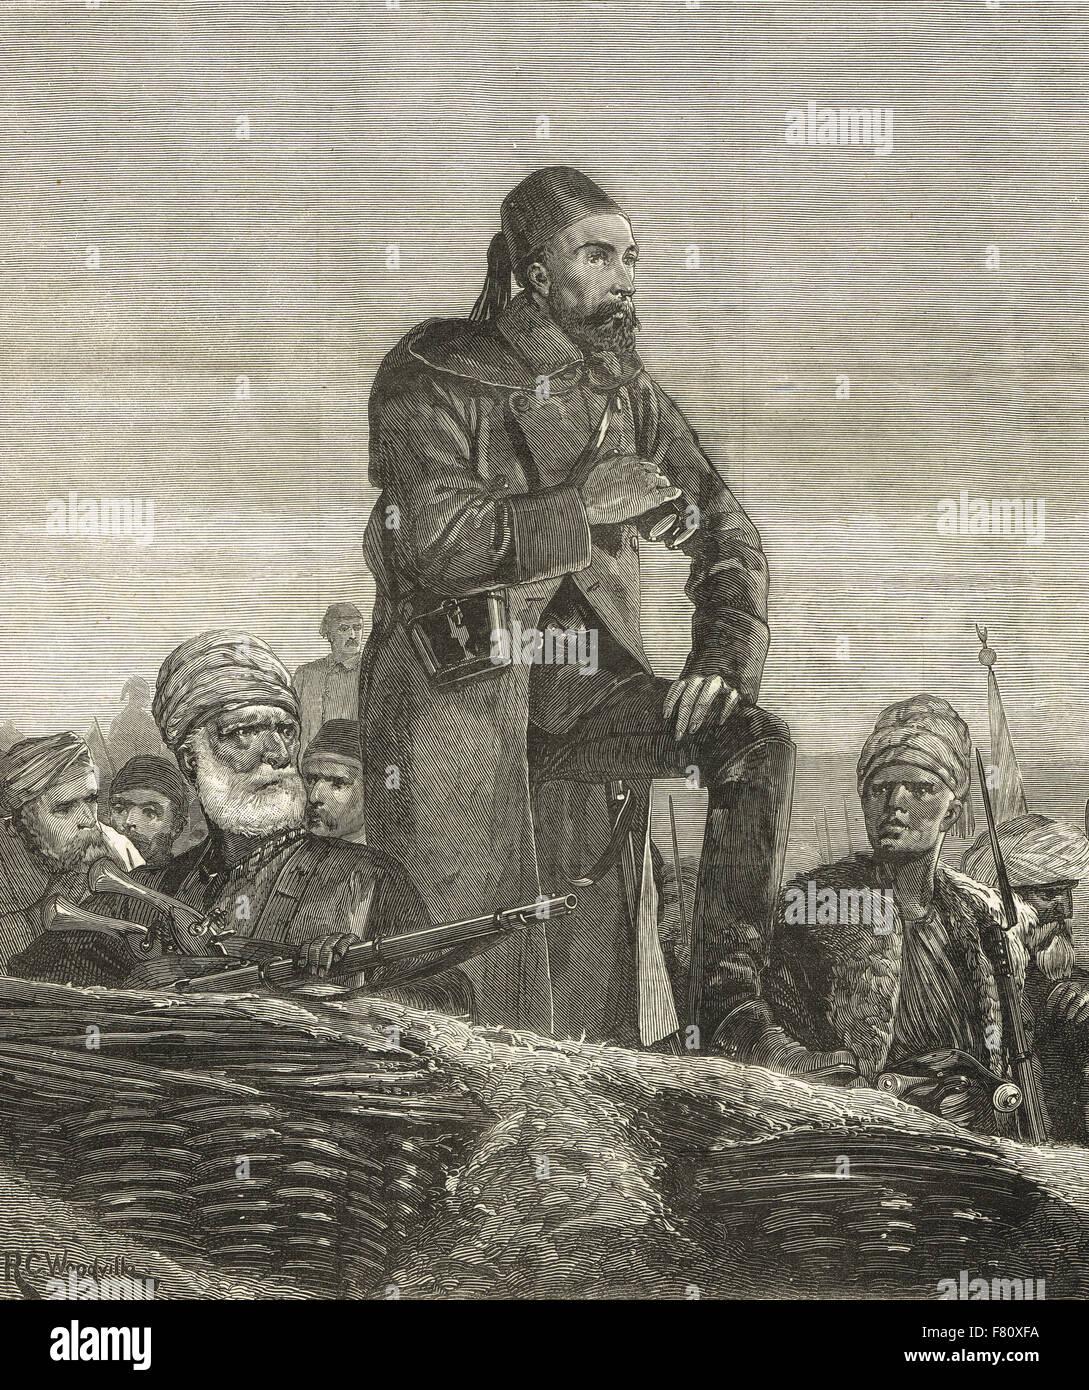 Osman Pasha Ottoman hero of  the siege of Plevna 1877 - Stock Image